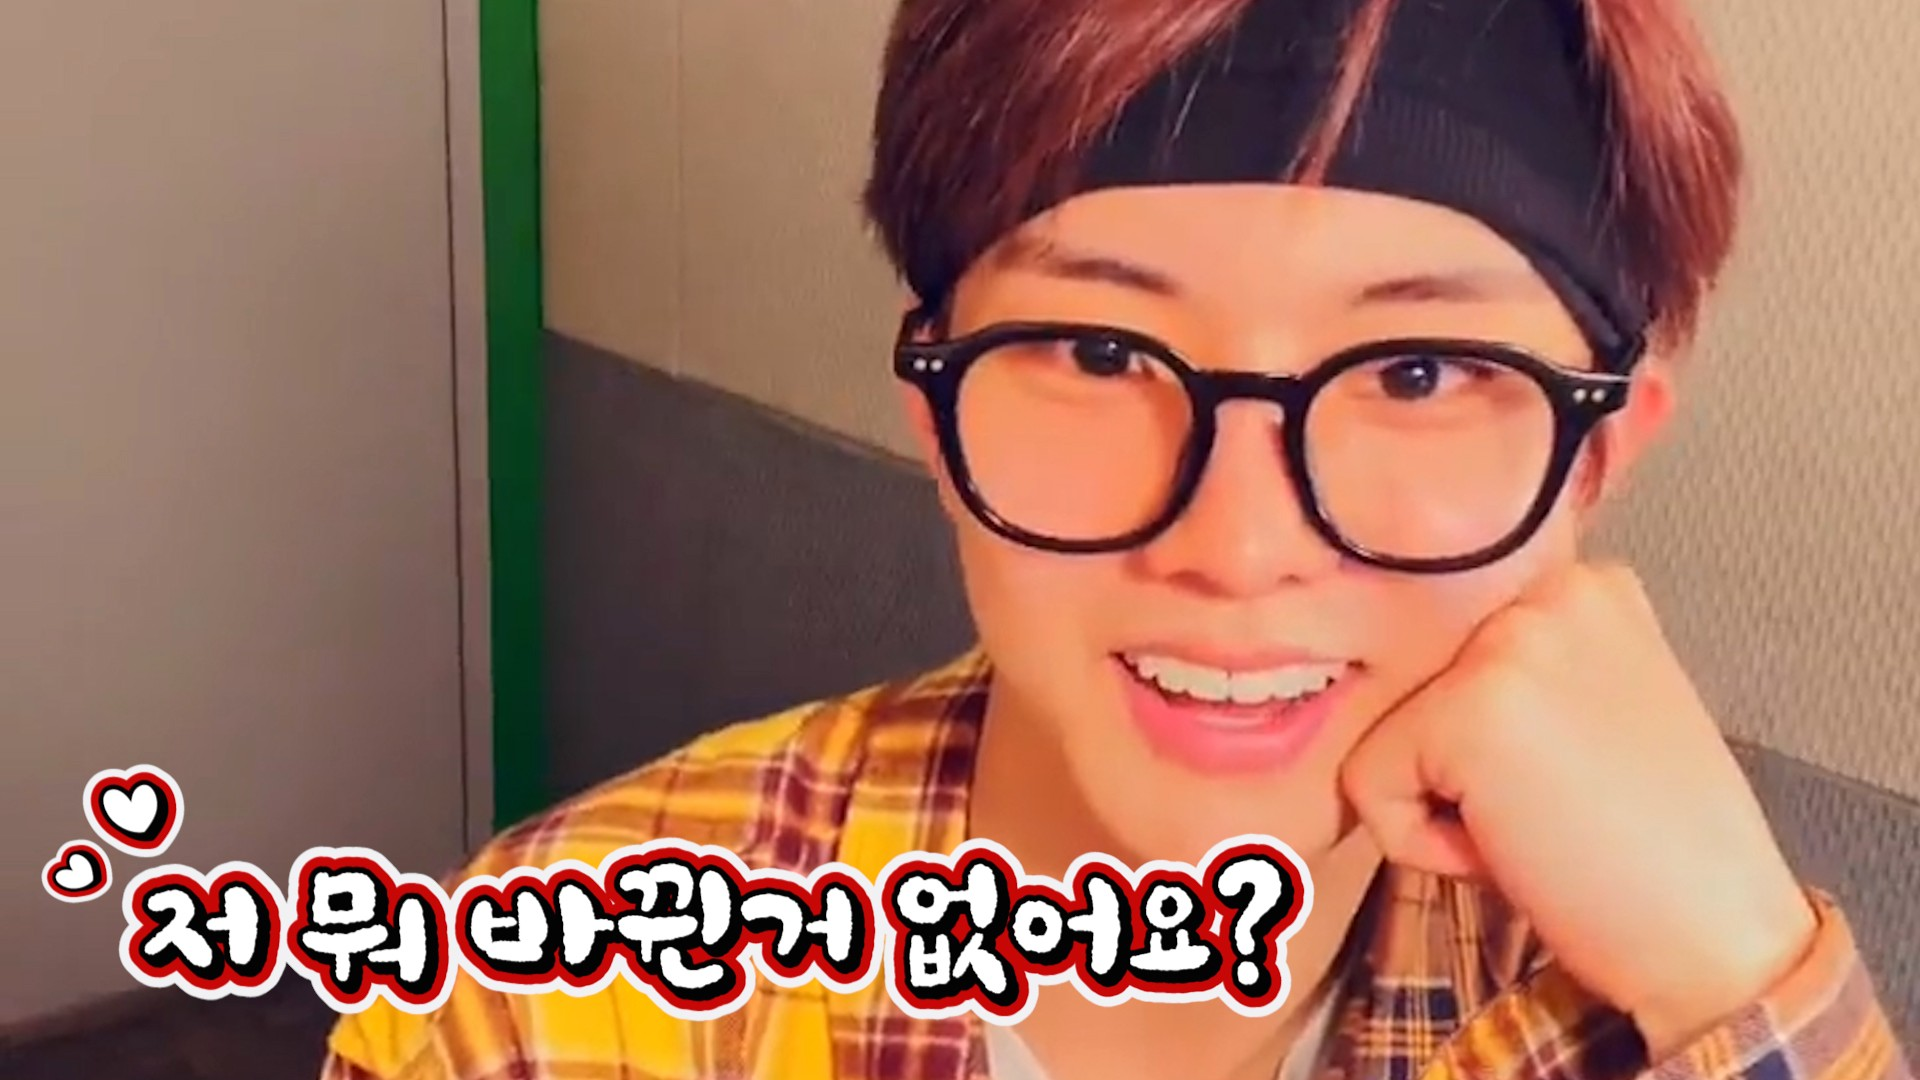 [THE BOYZ] 큐랑둥이만 보면 너무 귀여워서 긴장하는 거 다 들켰네 🐿️❣️ (Q talking about his new hairstyle)